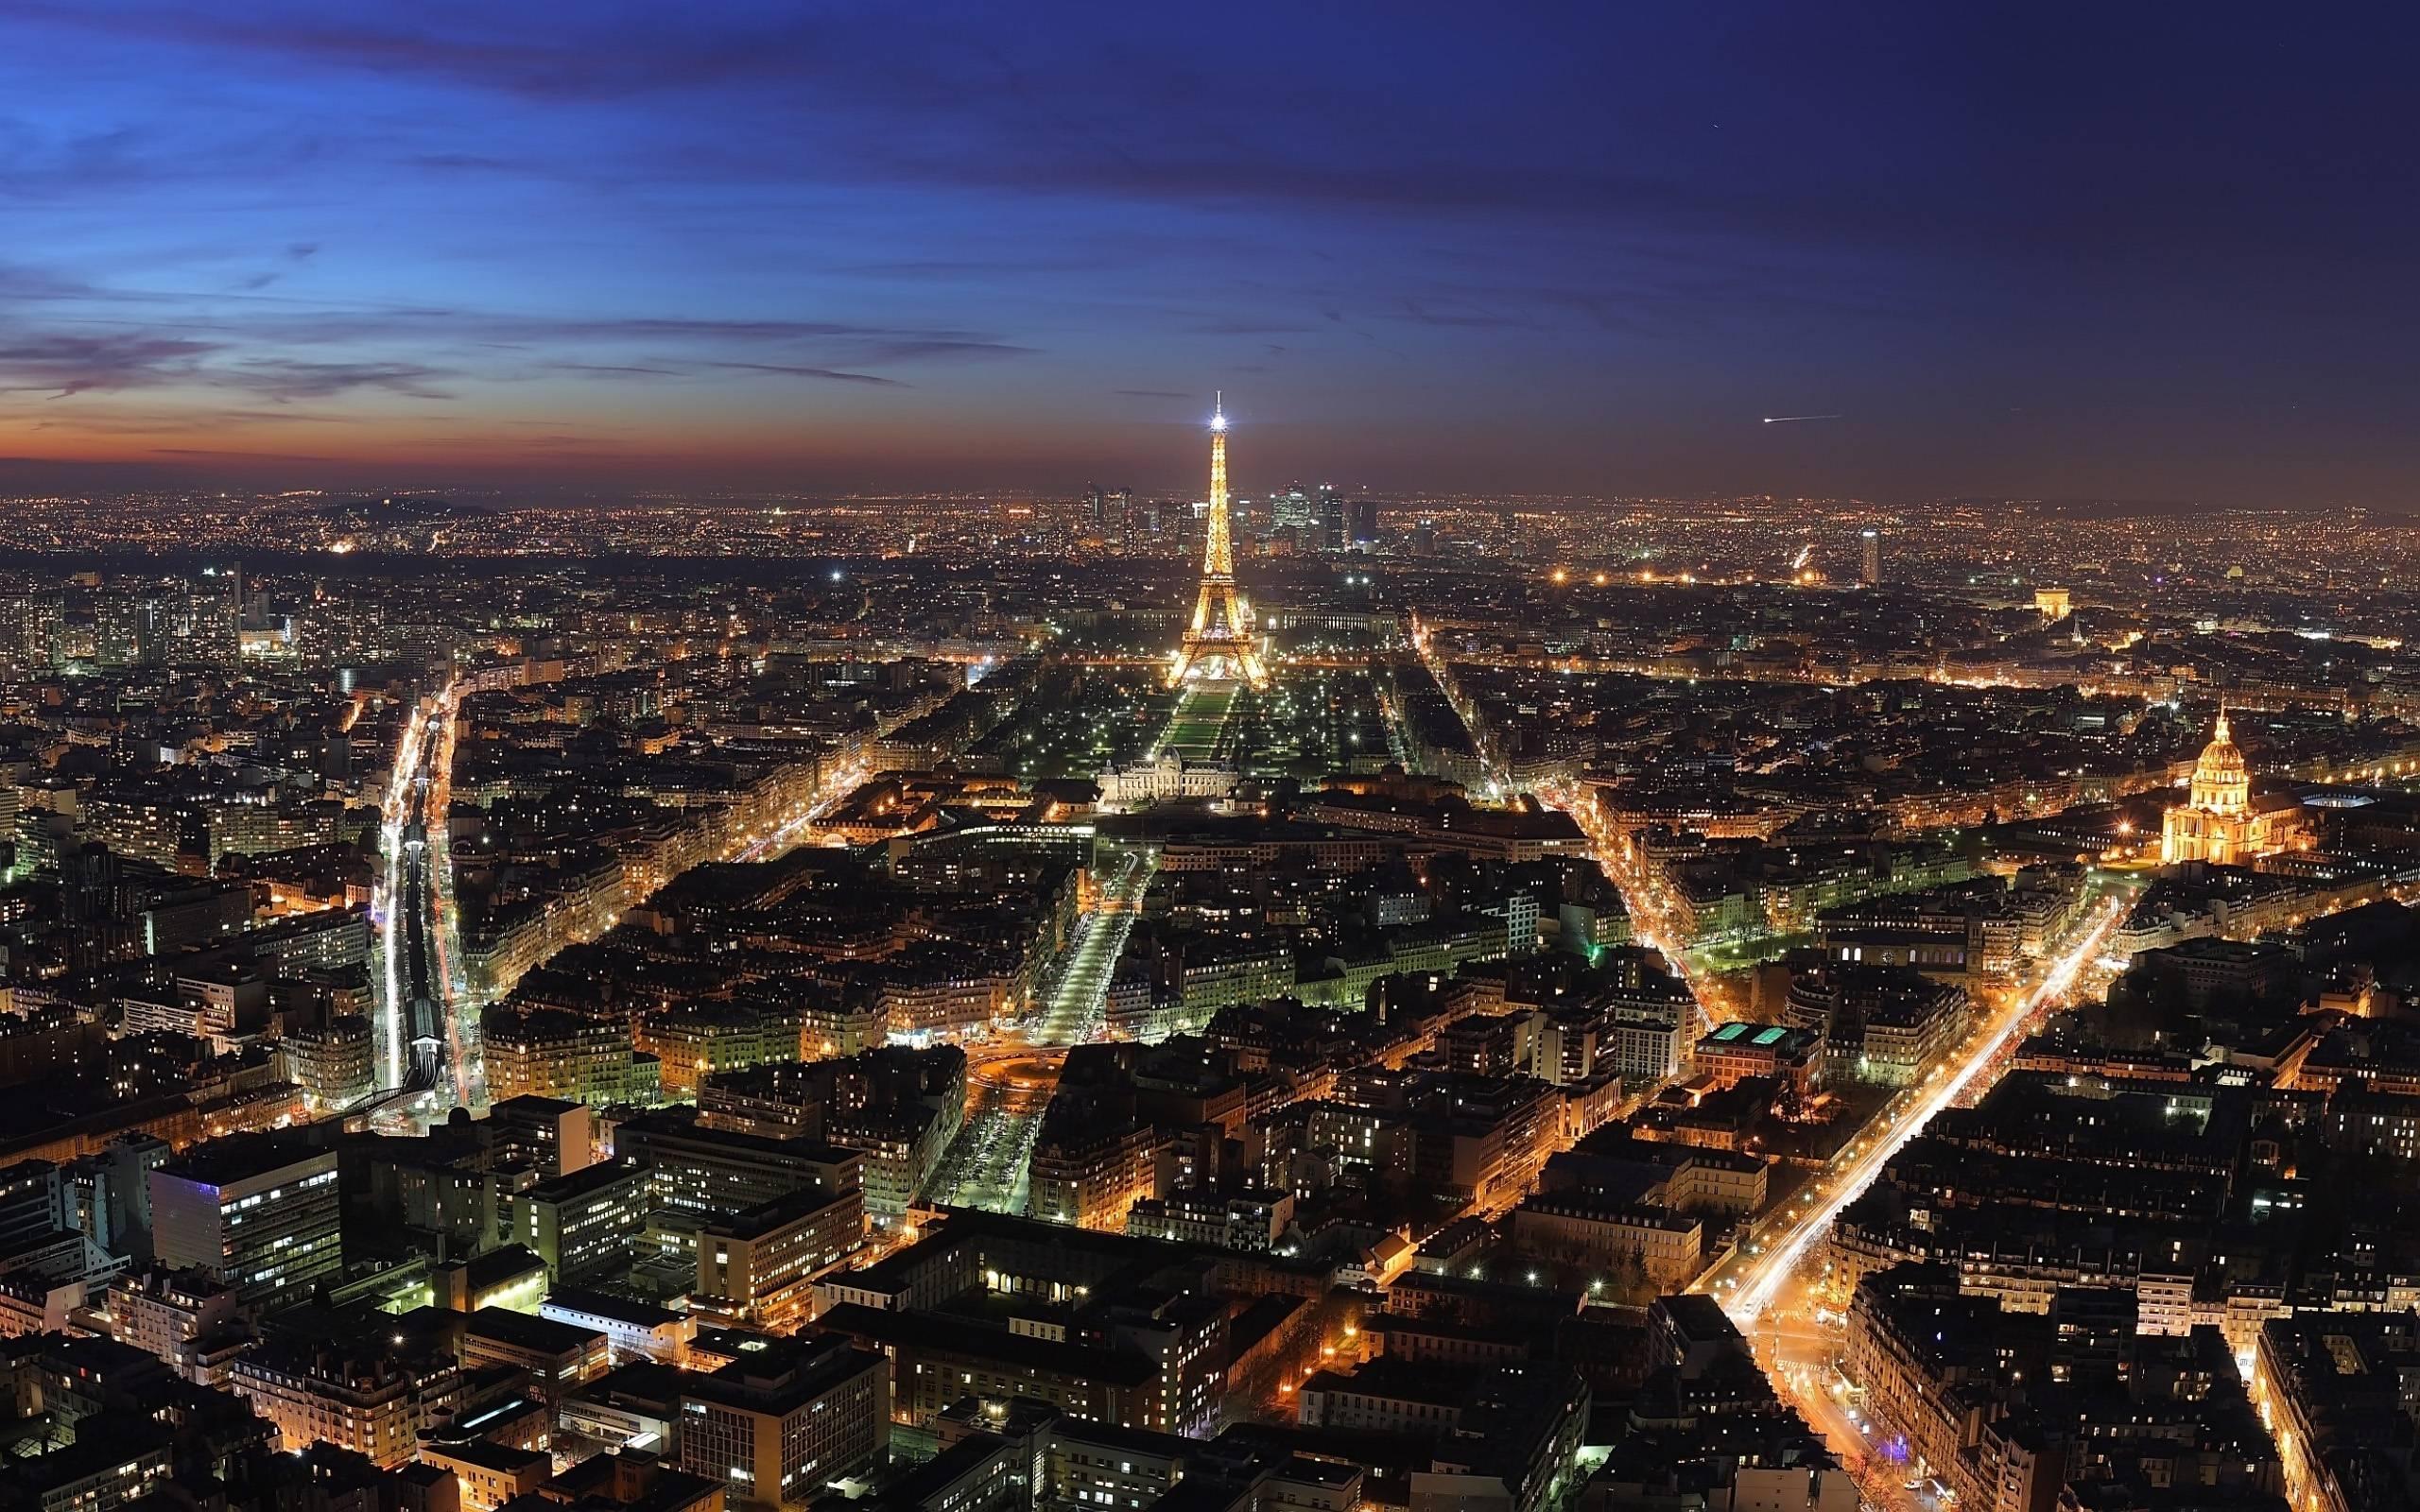 Images Wallpaper » Paris Wallpaper